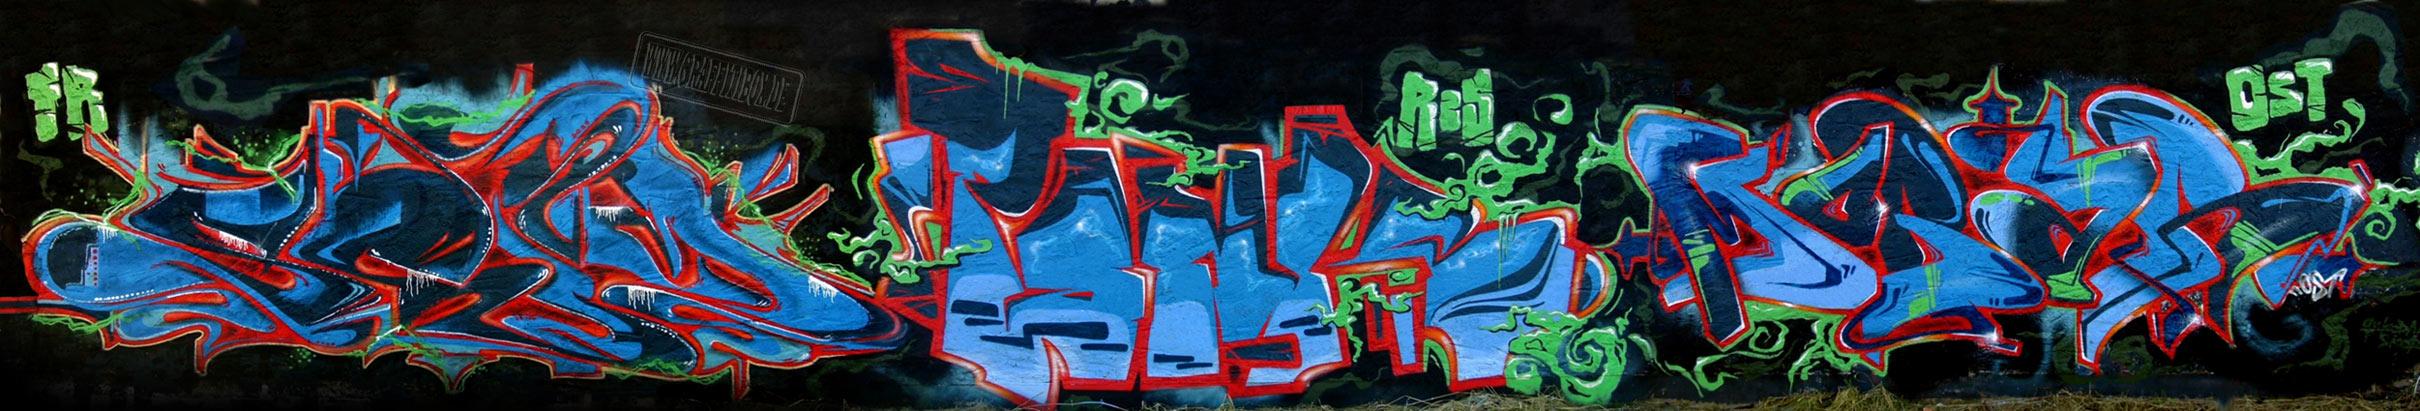 awww.graffitibox.de_stylewoche.jpg